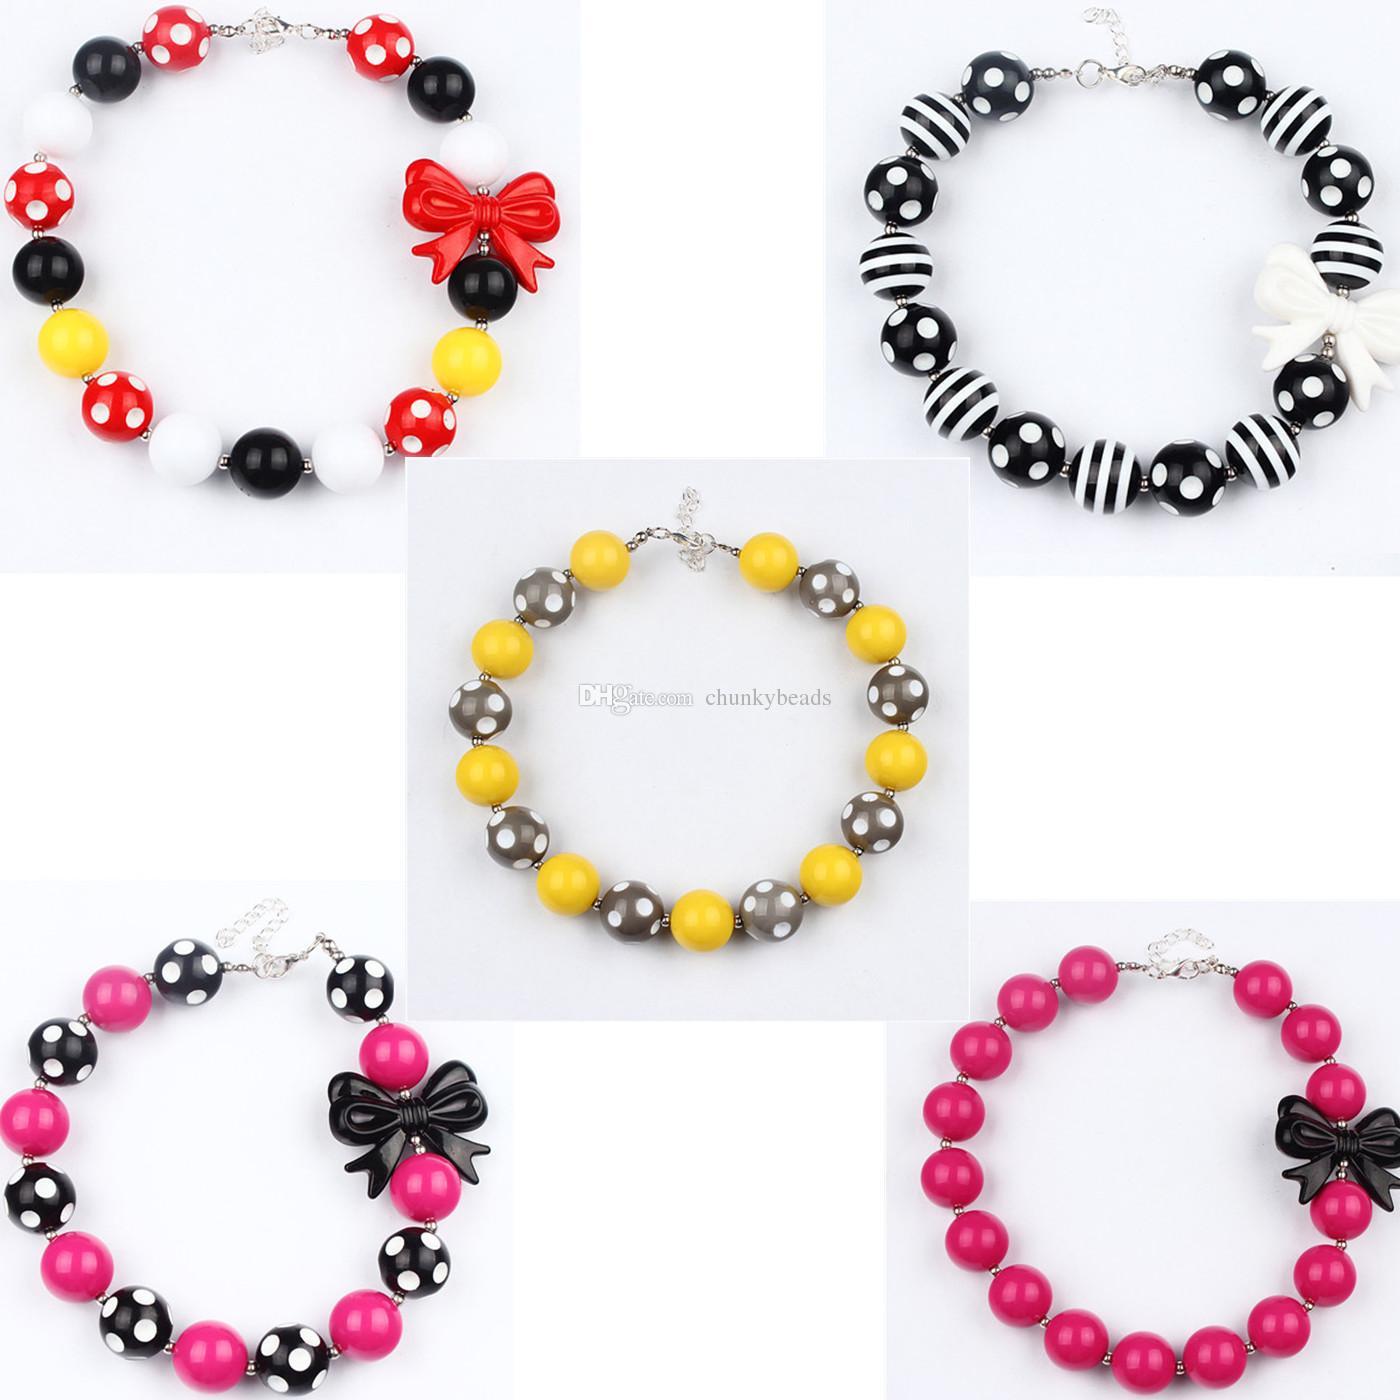 fashion jewelry beads necklace cartoon beads necklace for baby children  kids jewelry decoration dress kehnxrd